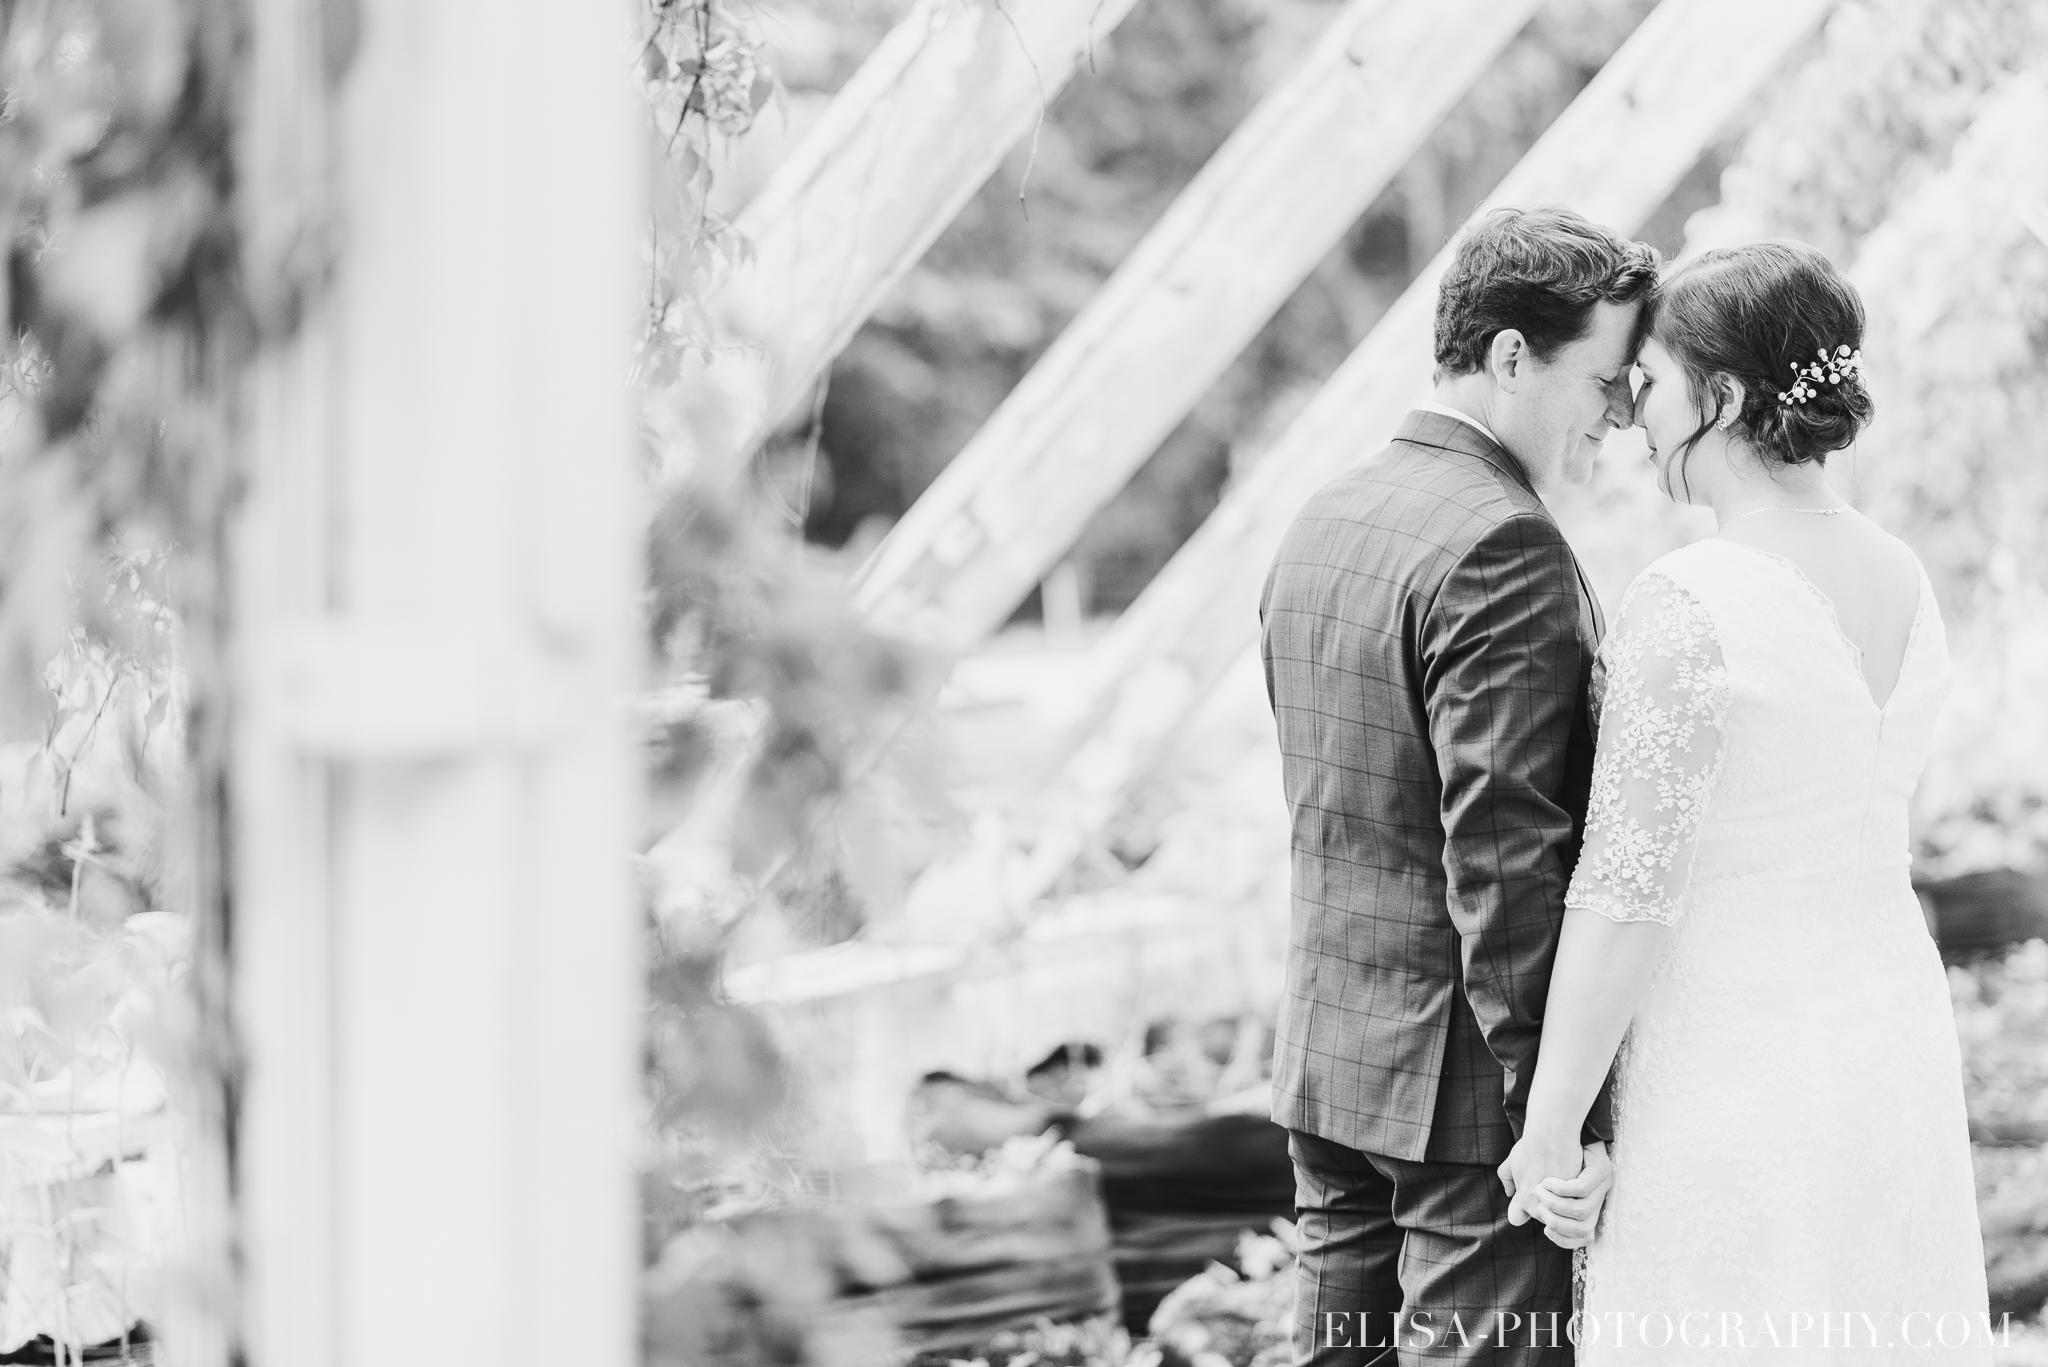 photo mariage domaine cataraqui wedding portrait couple inspiration anglaise jardin ville de quebec 2570 - Mariage d'inspiration anglaise au domaine Cataraqui